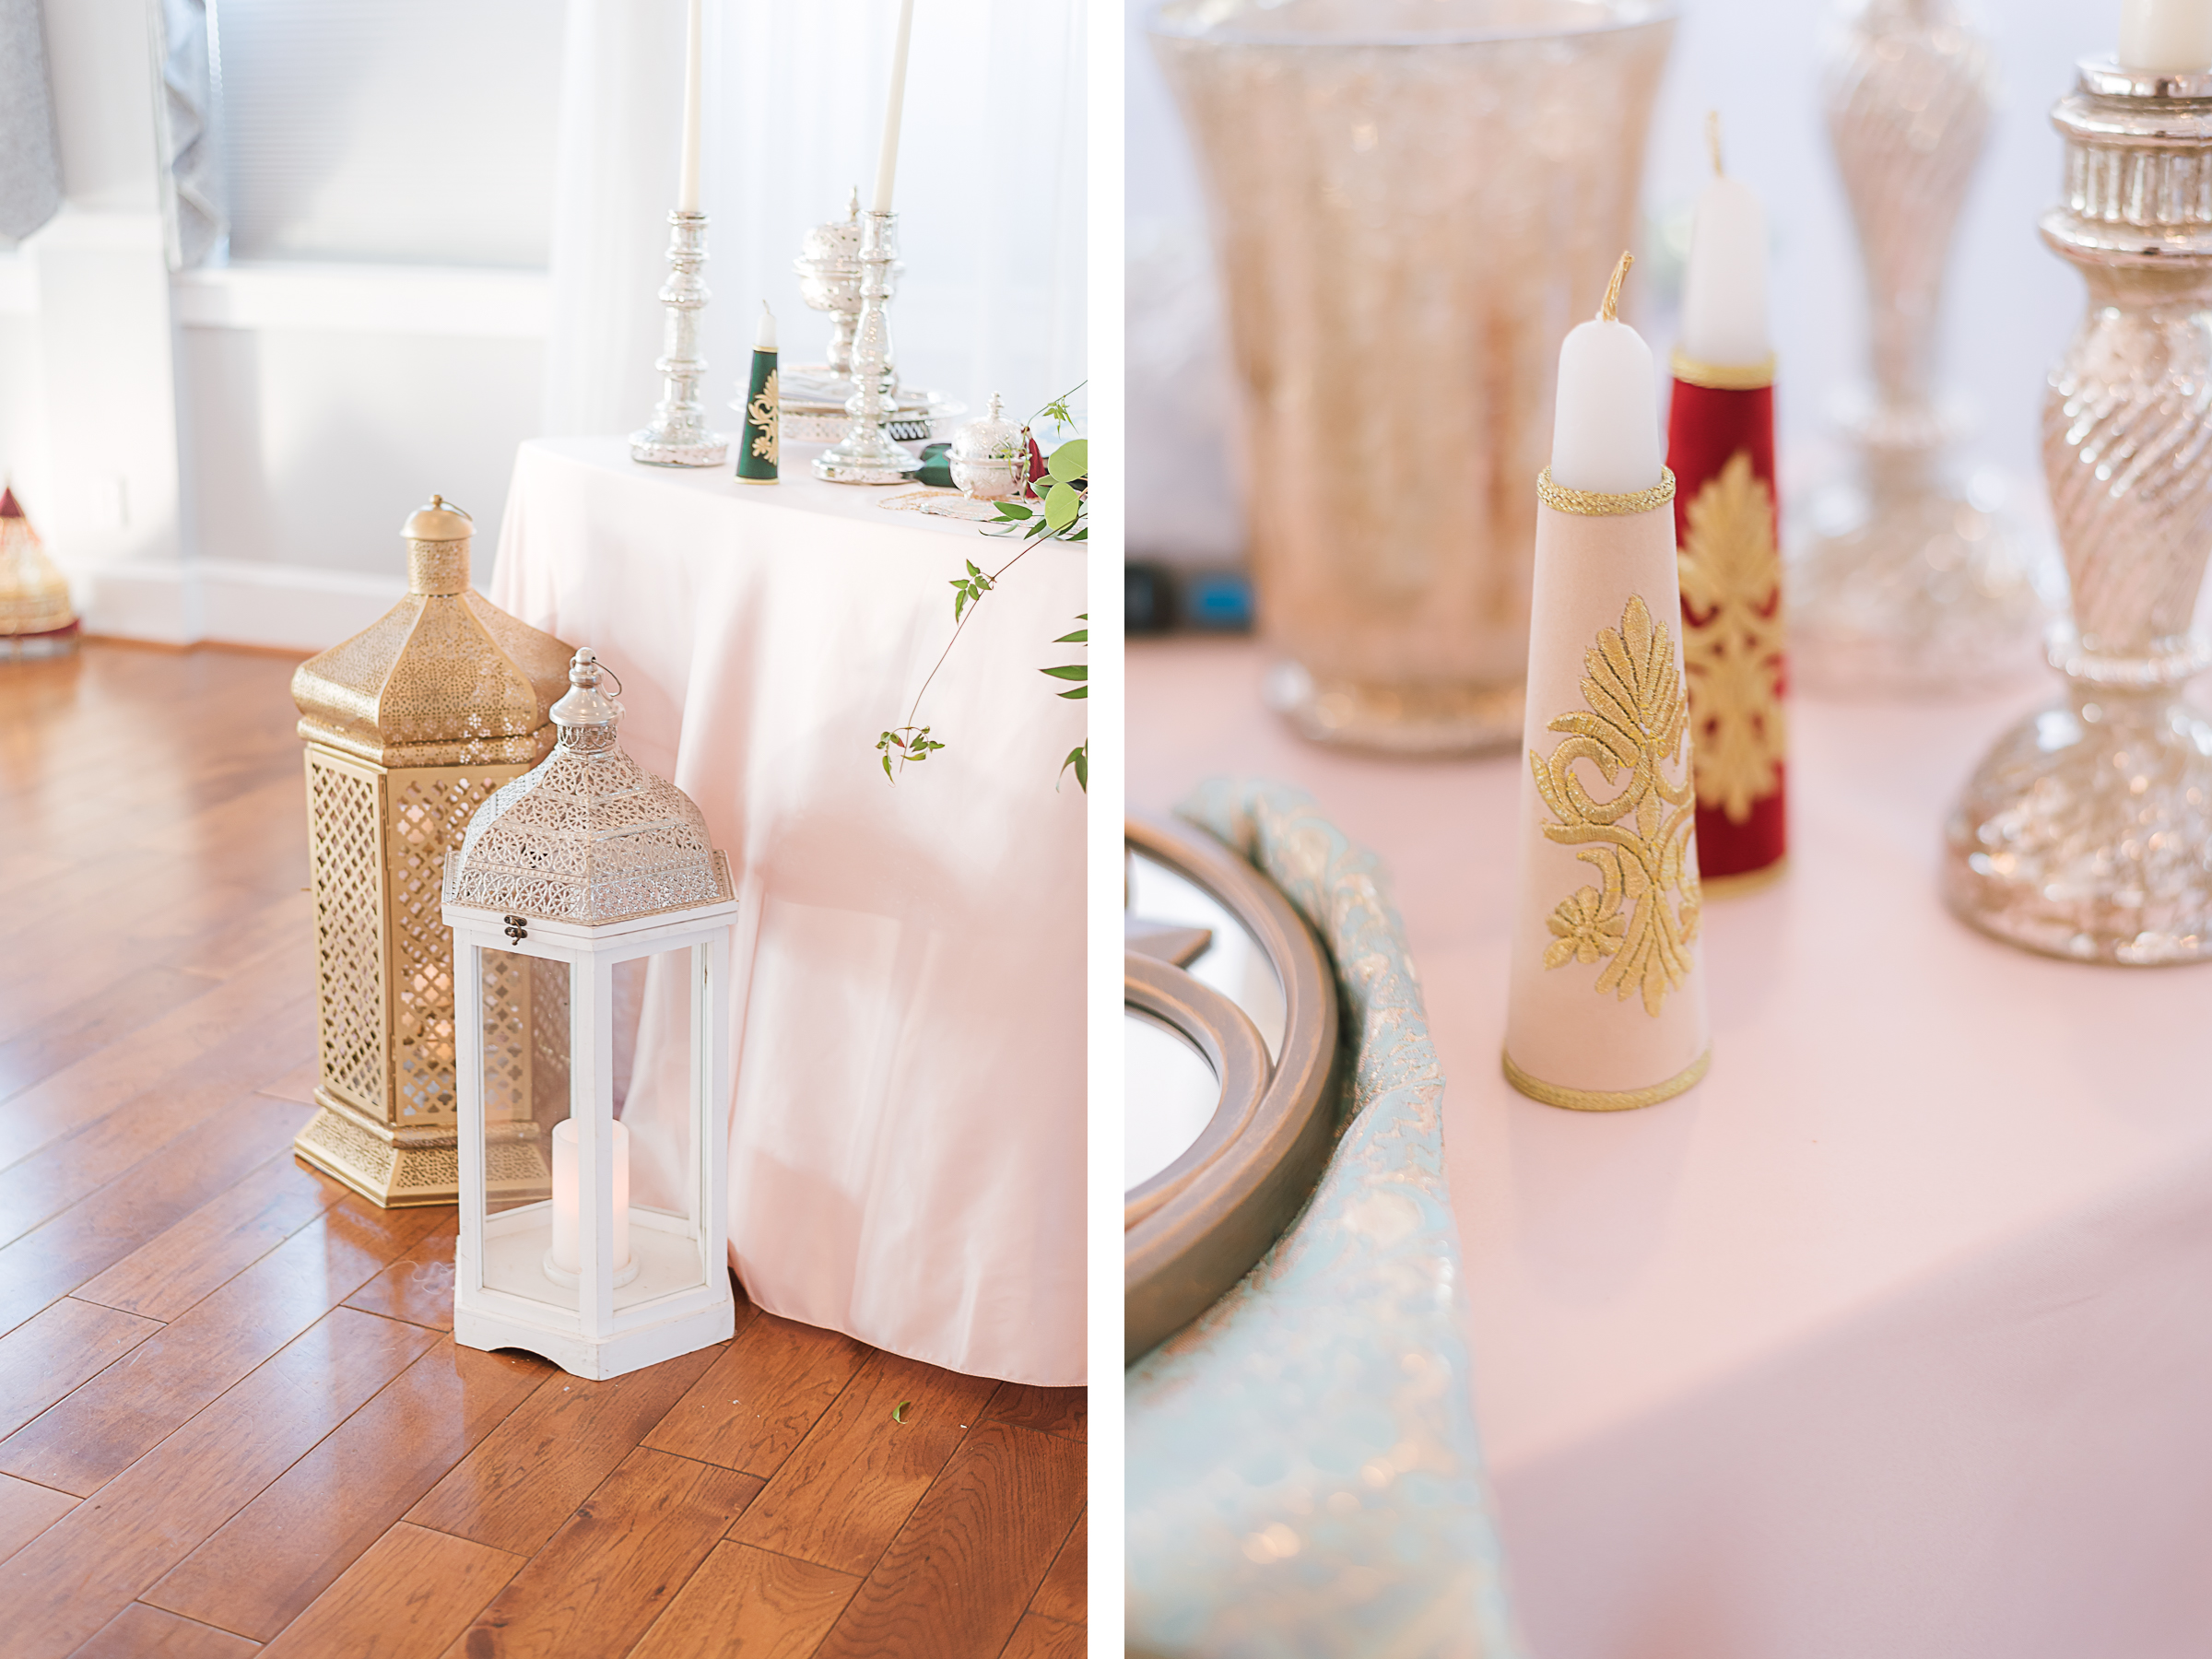 MD-Herrington-on-the-Bay-Wedding-Reception-Cultural-Ceremony-Details.jpg